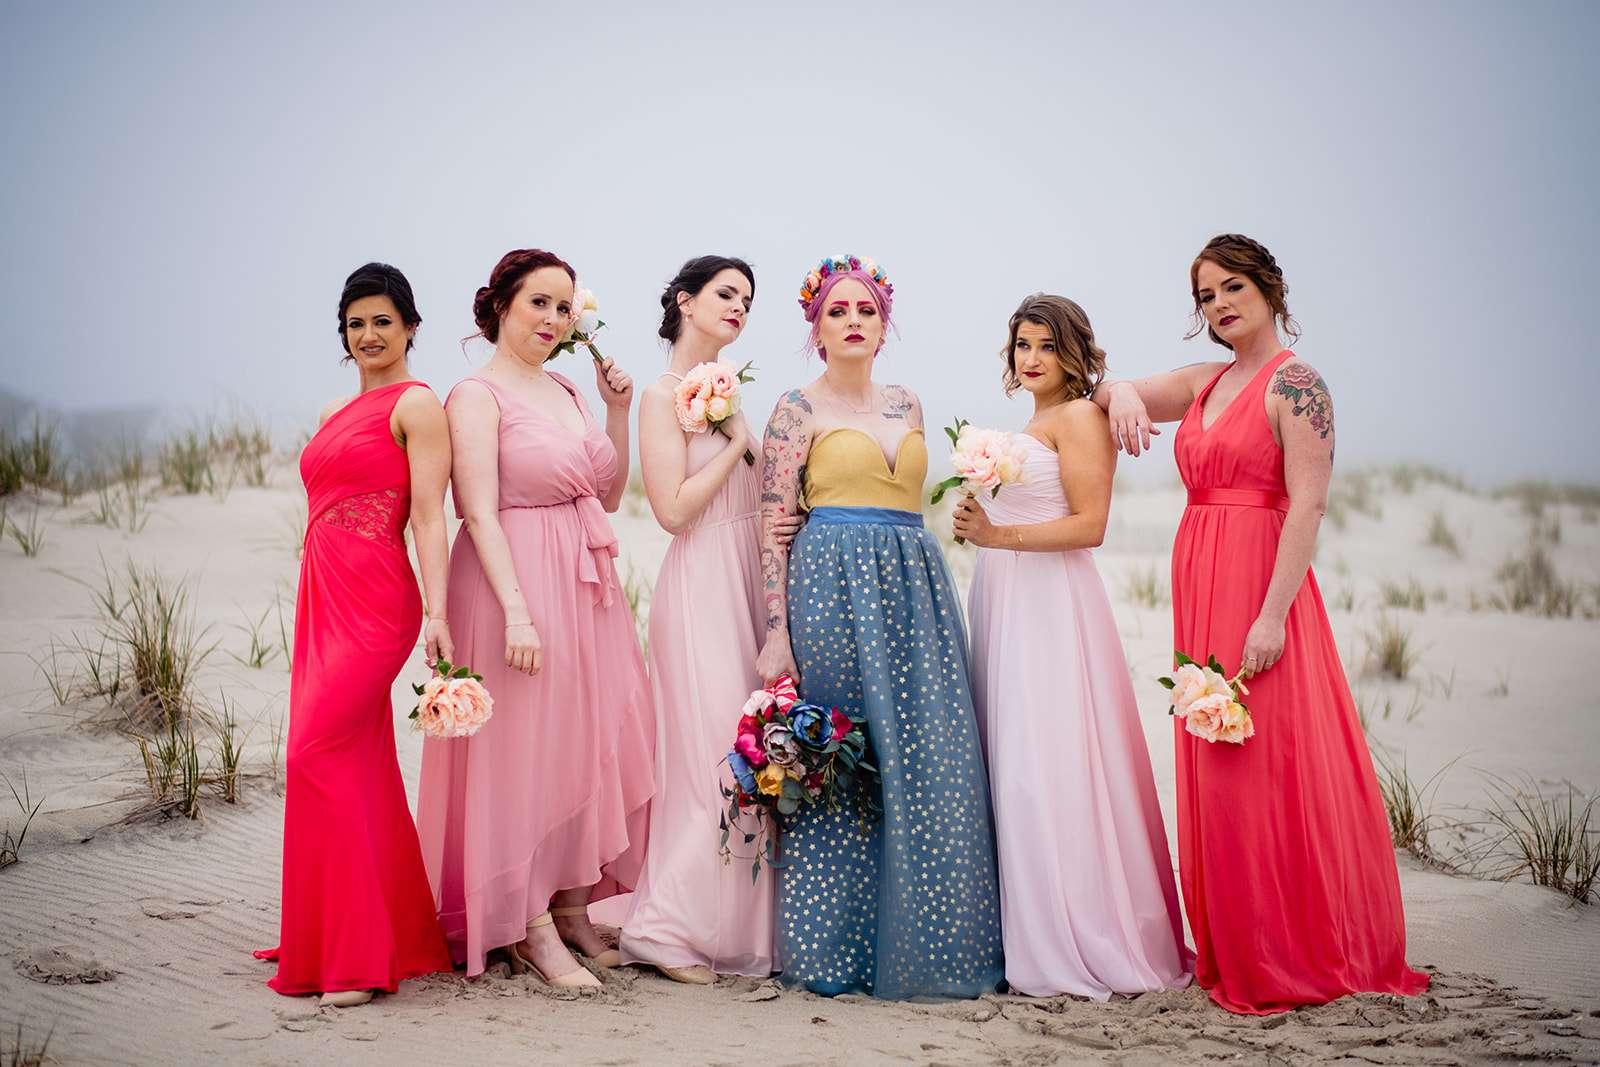 Colourful \u0026 Casual, New Jersey Beach Wedding with Hawaiian